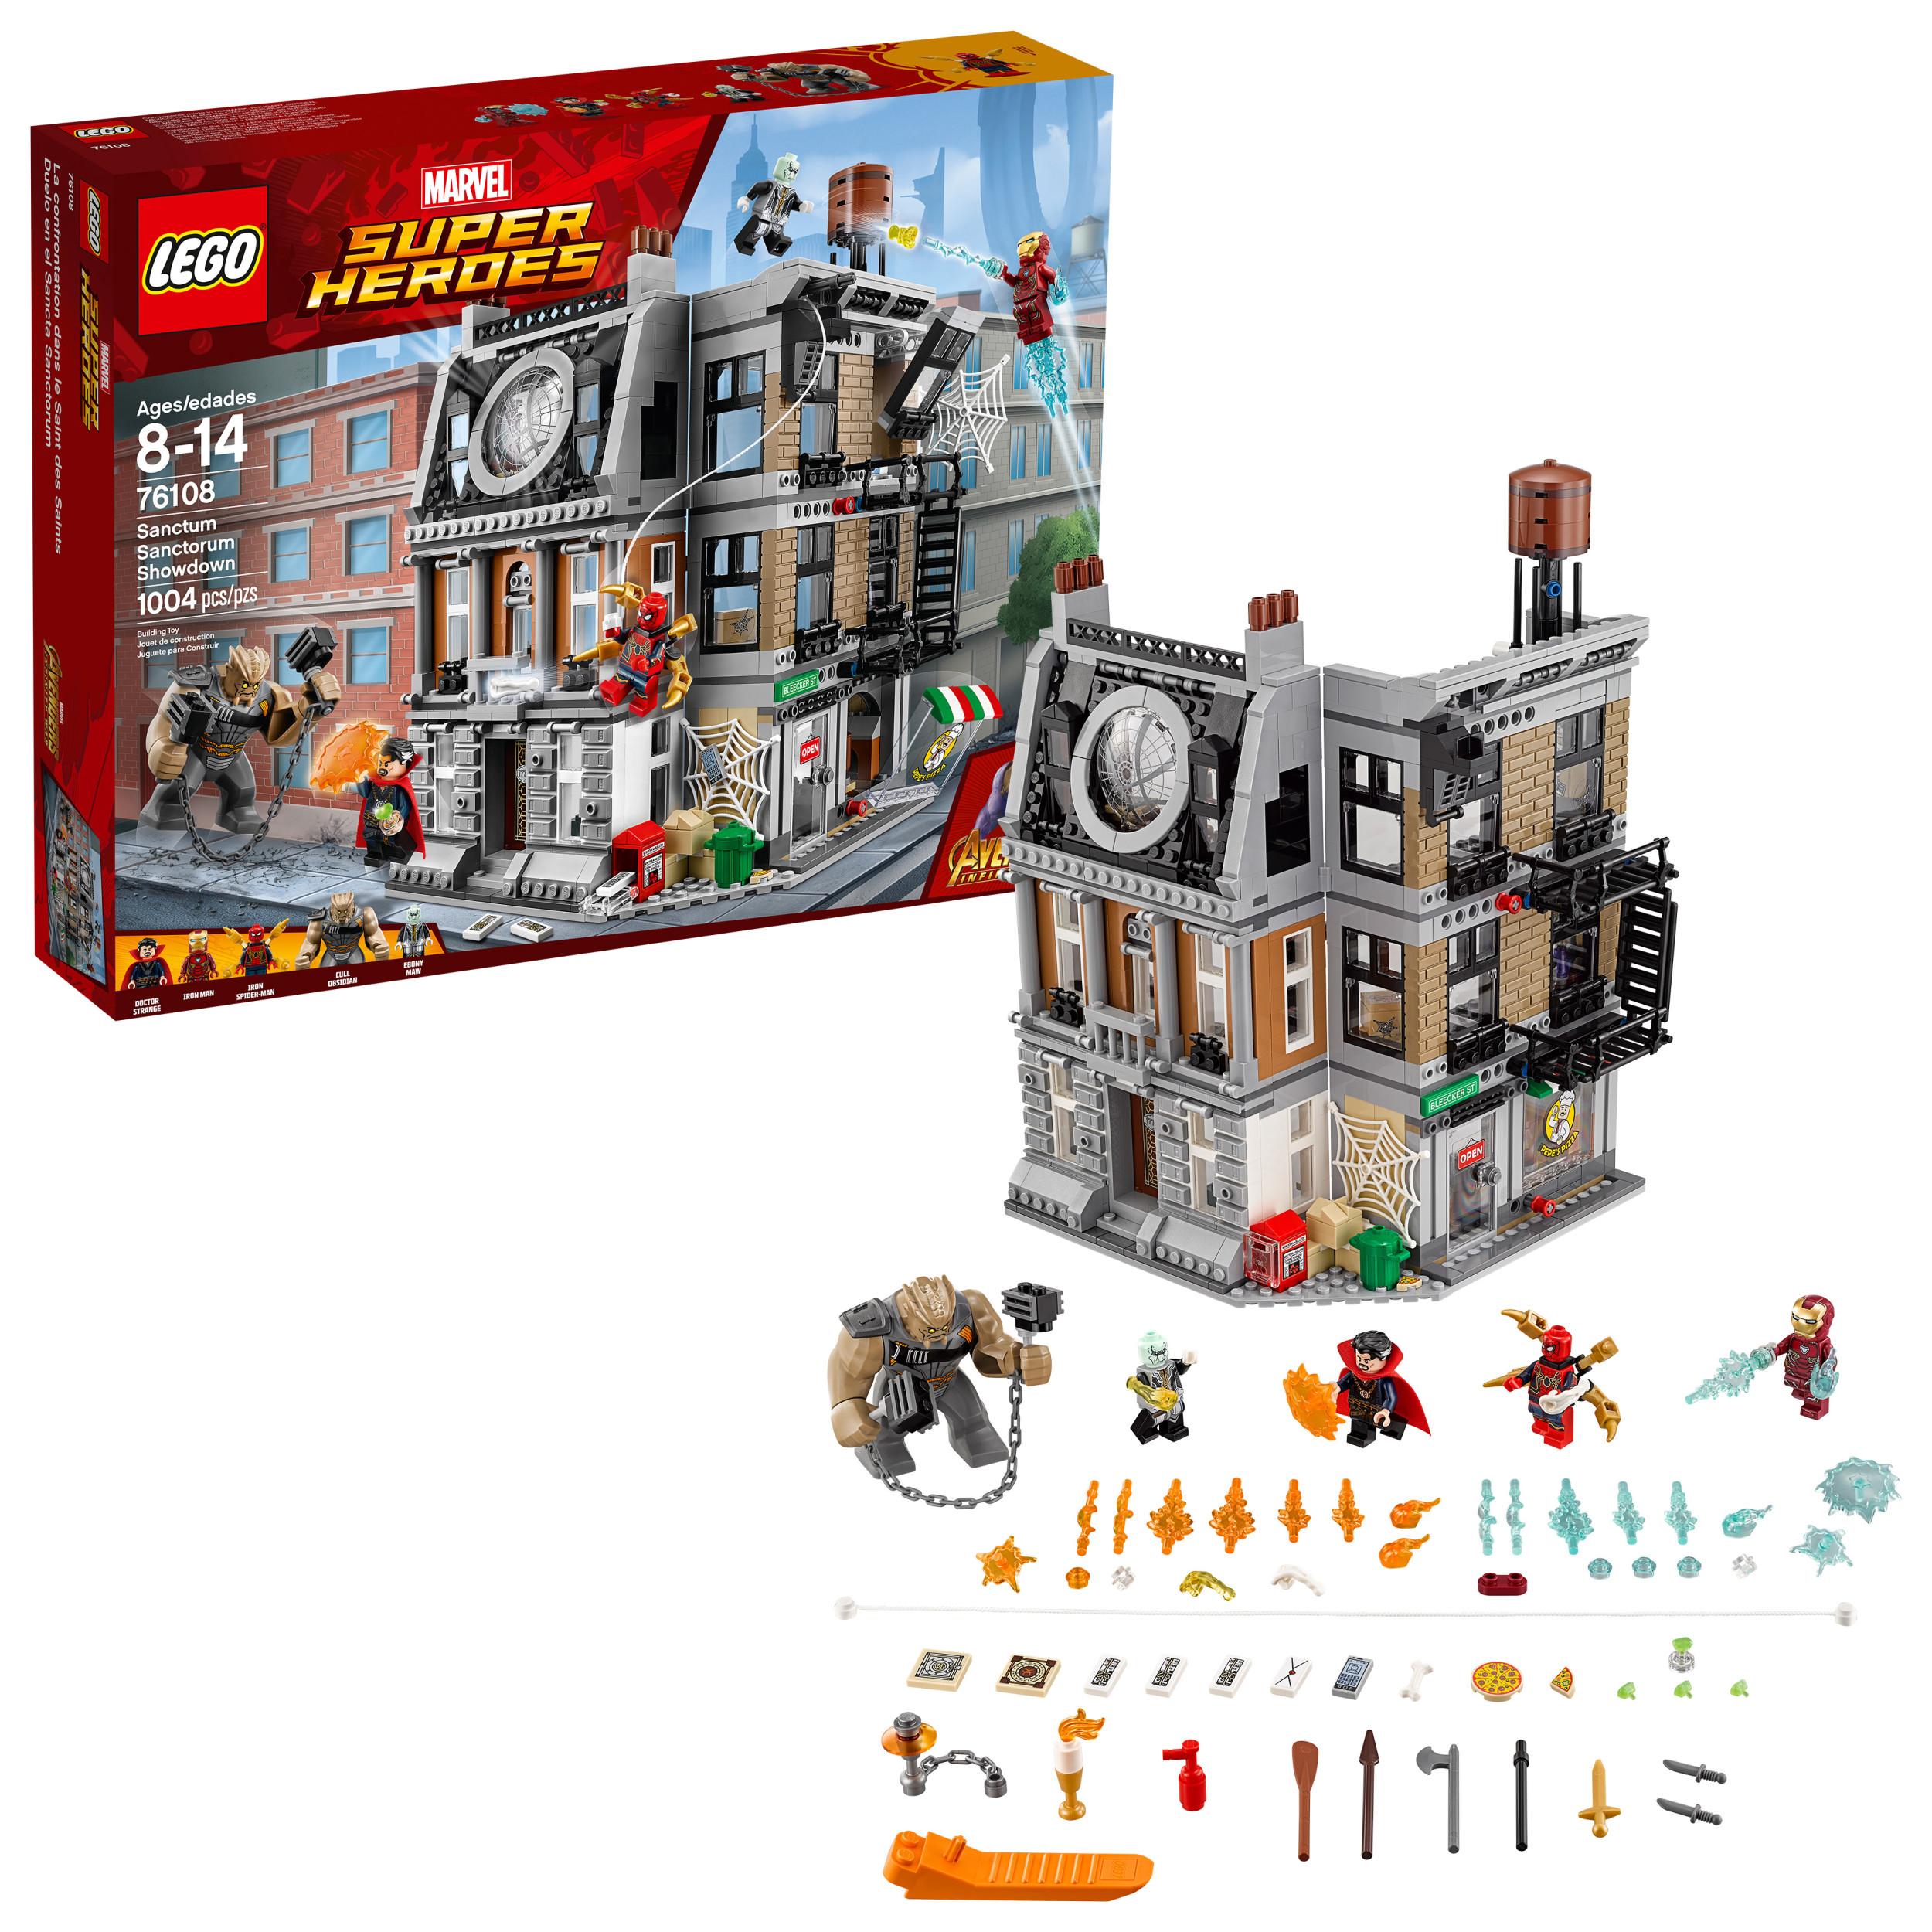 Lego Marvel Super Heroes Avengers Sanctum Sanctorum Showdown 76108 by LEGO System Inc